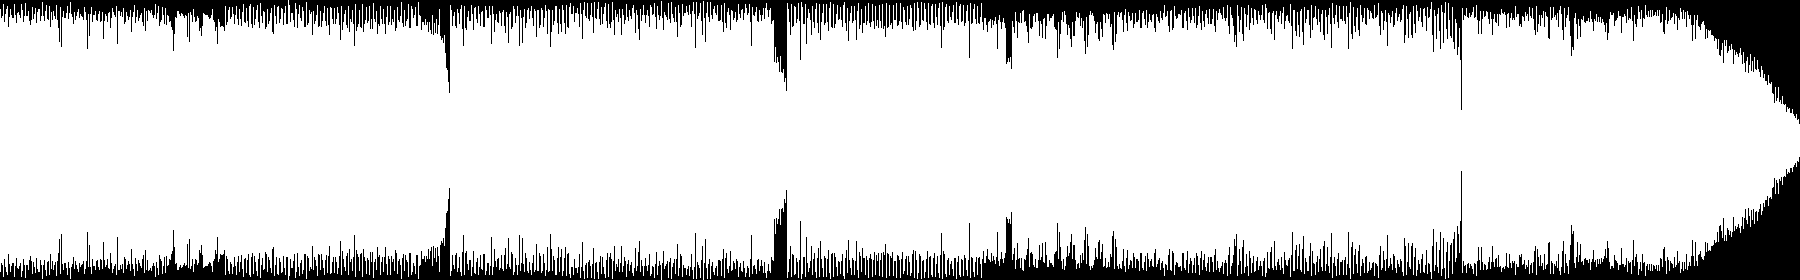 Disco In Key C audio waveform